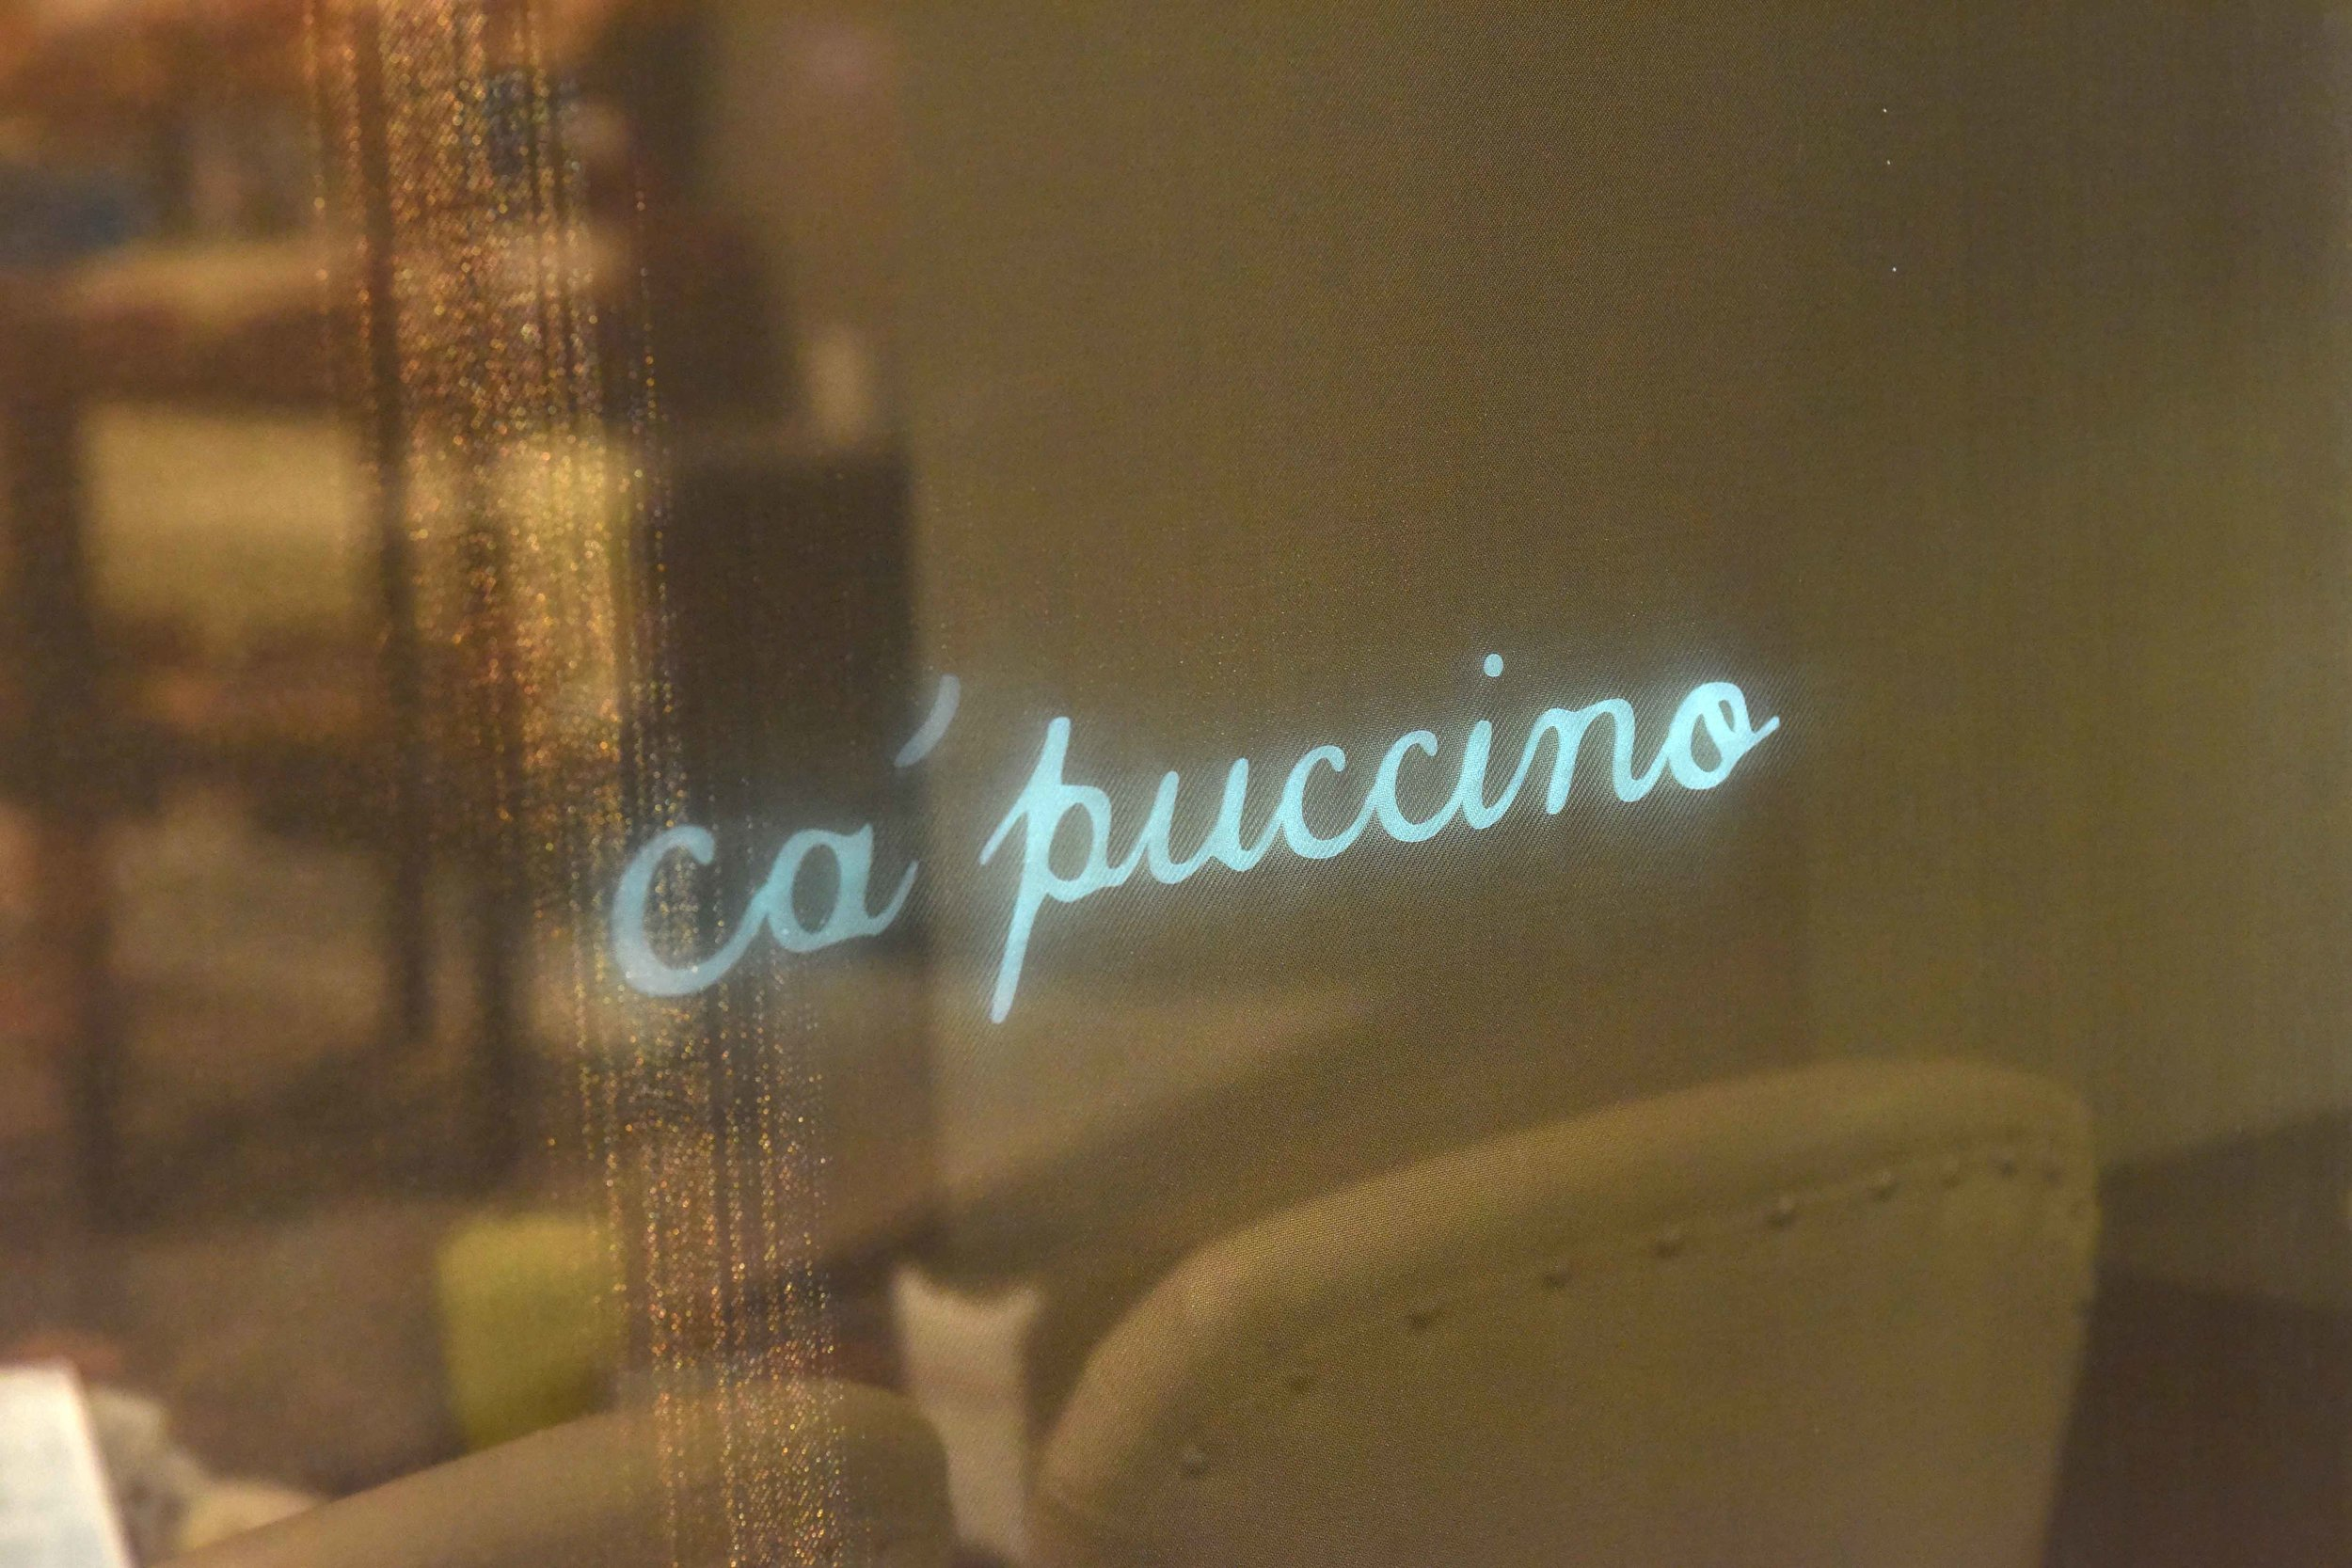 Ca'puccino, cafe at Harrods. Image©thingstodot.com